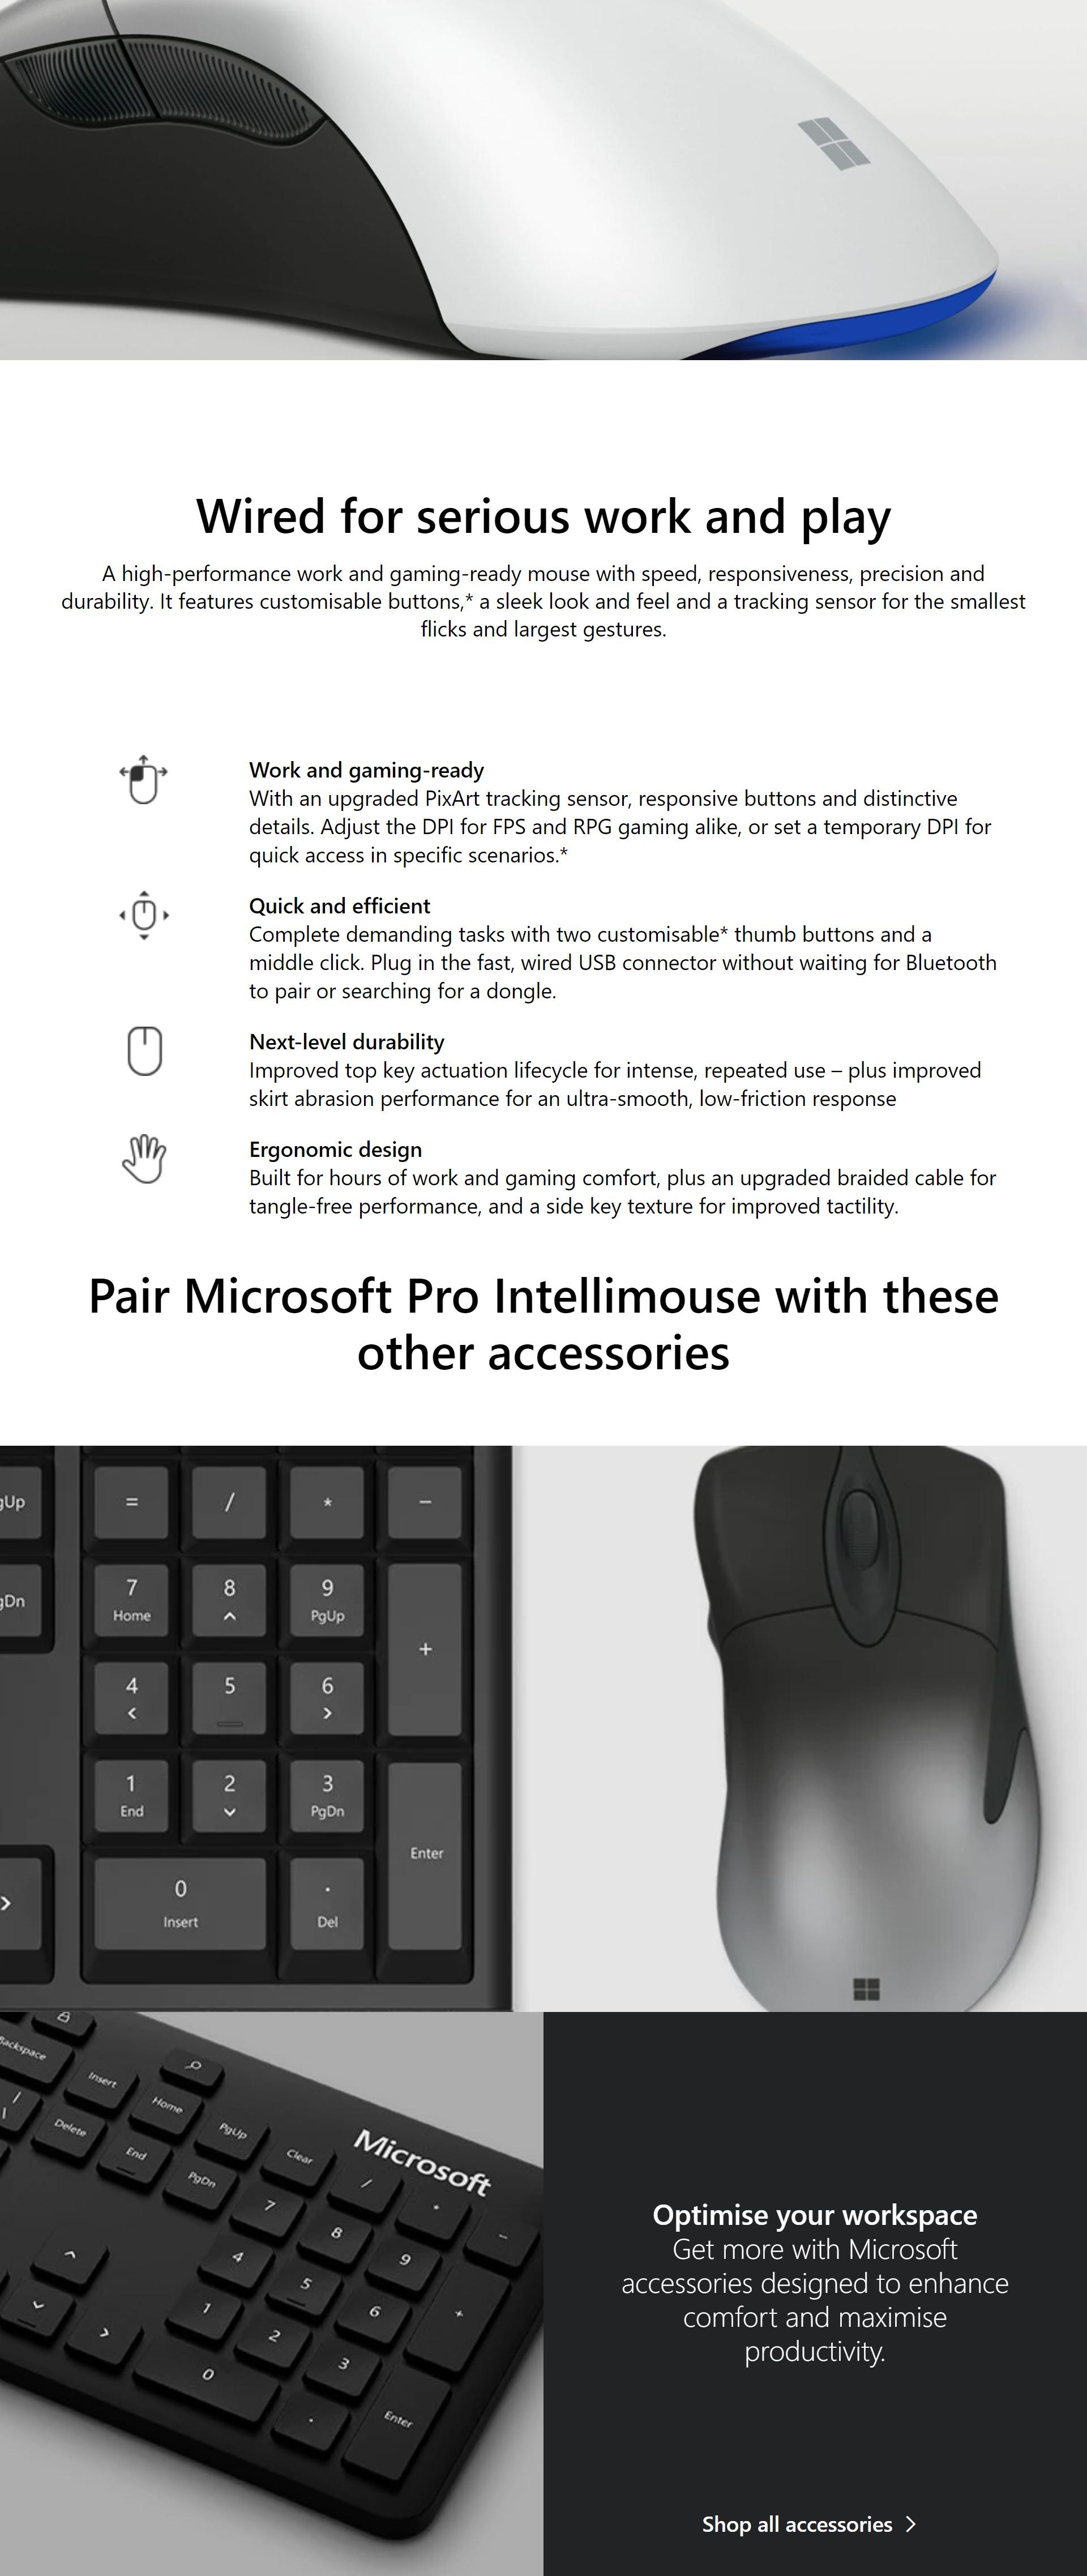 screencapture-microsoft-en-au-p-microsoft-pro-intellimouse-8RS0HWW7DHNK-4M7H-2021-04-12-12_55_13.jpg